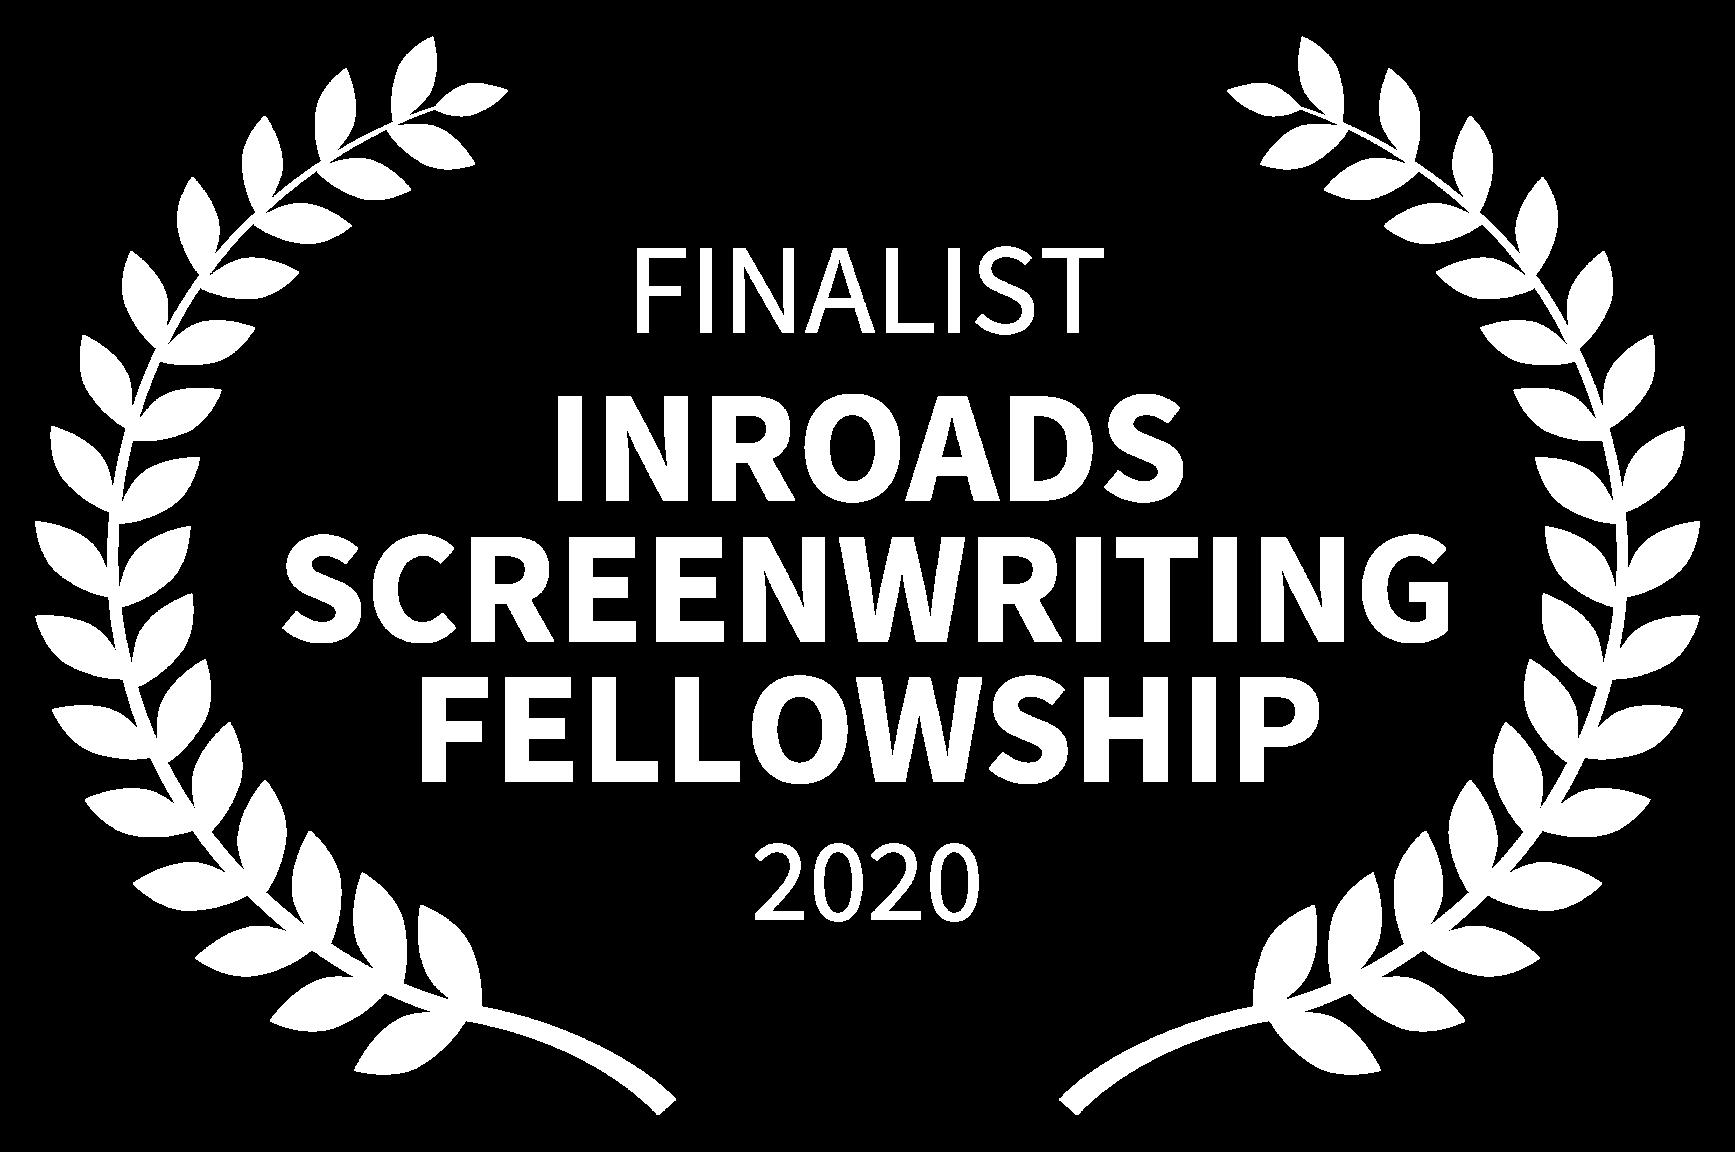 FINALIST-INROADS-SCREENWRITING-FELLOWSHIP-2020